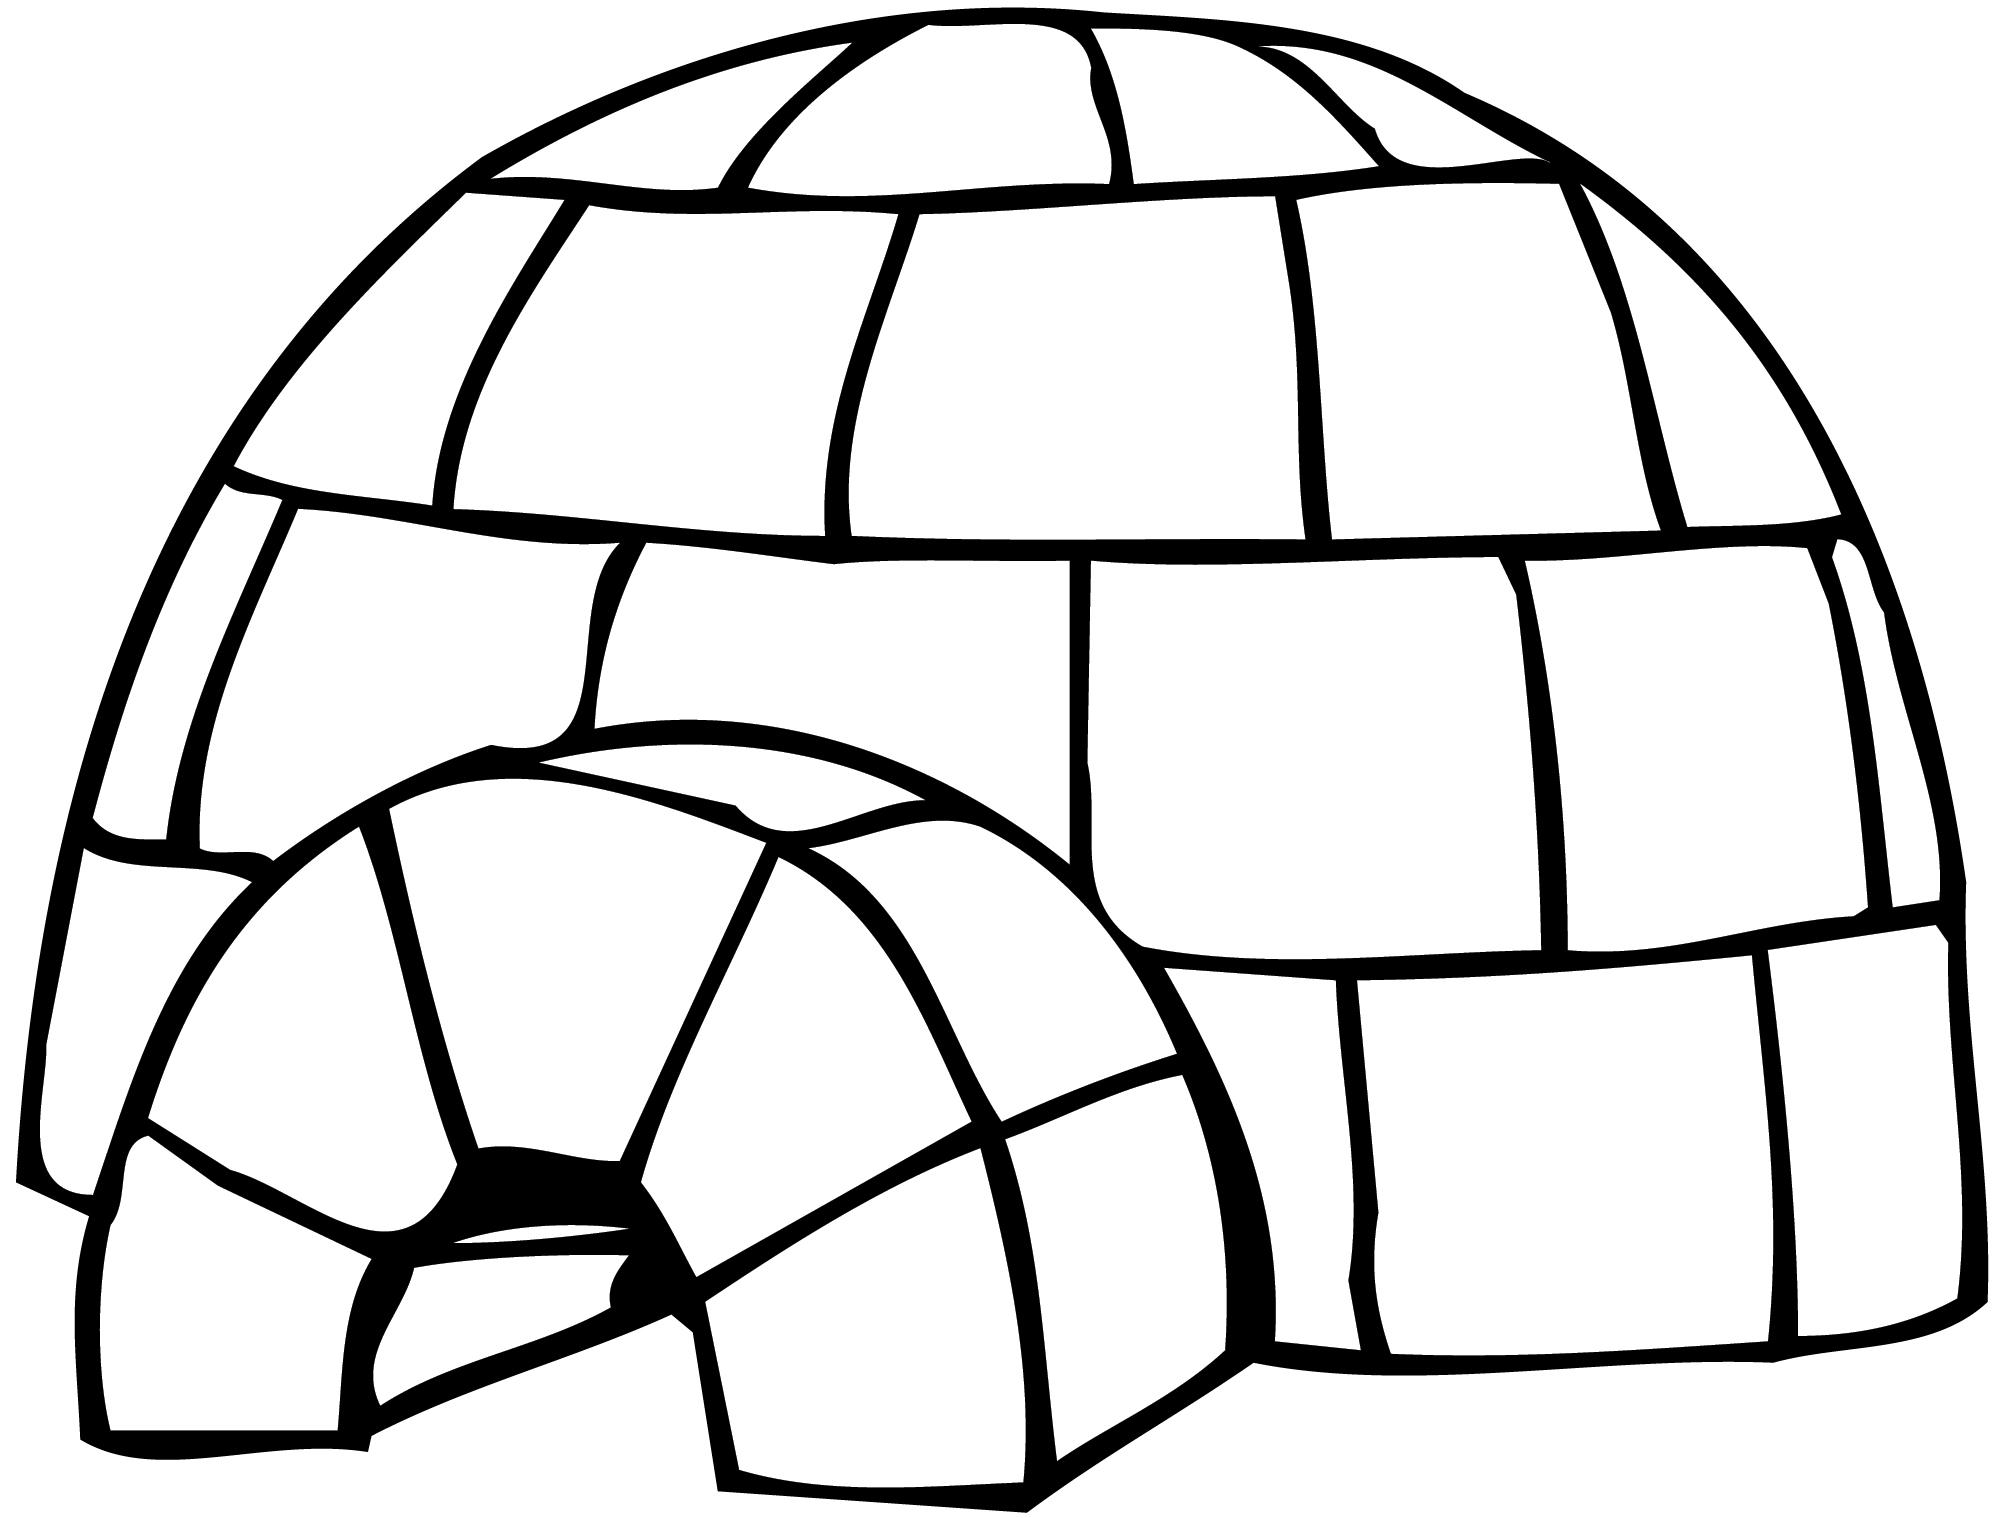 dessin igloo coloriage à dessiner